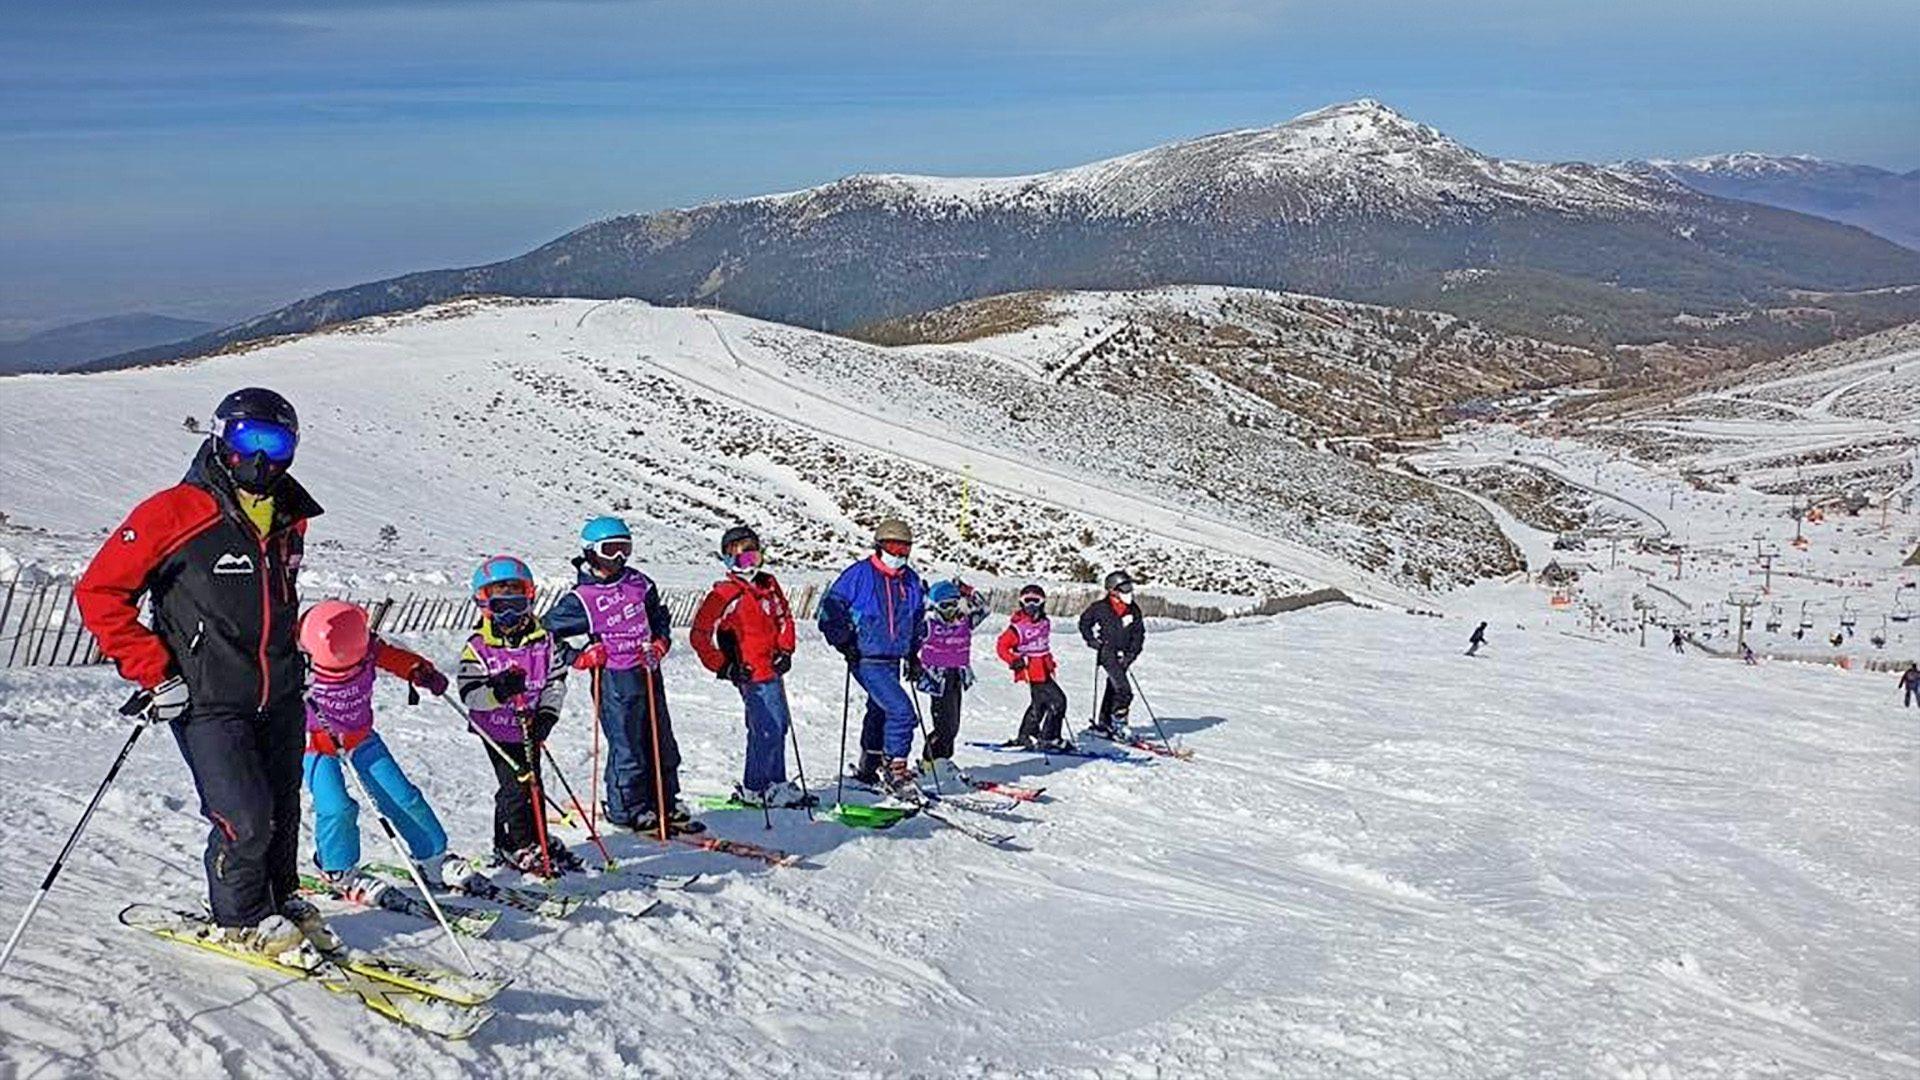 Aprende a esquiar con @Montaventura